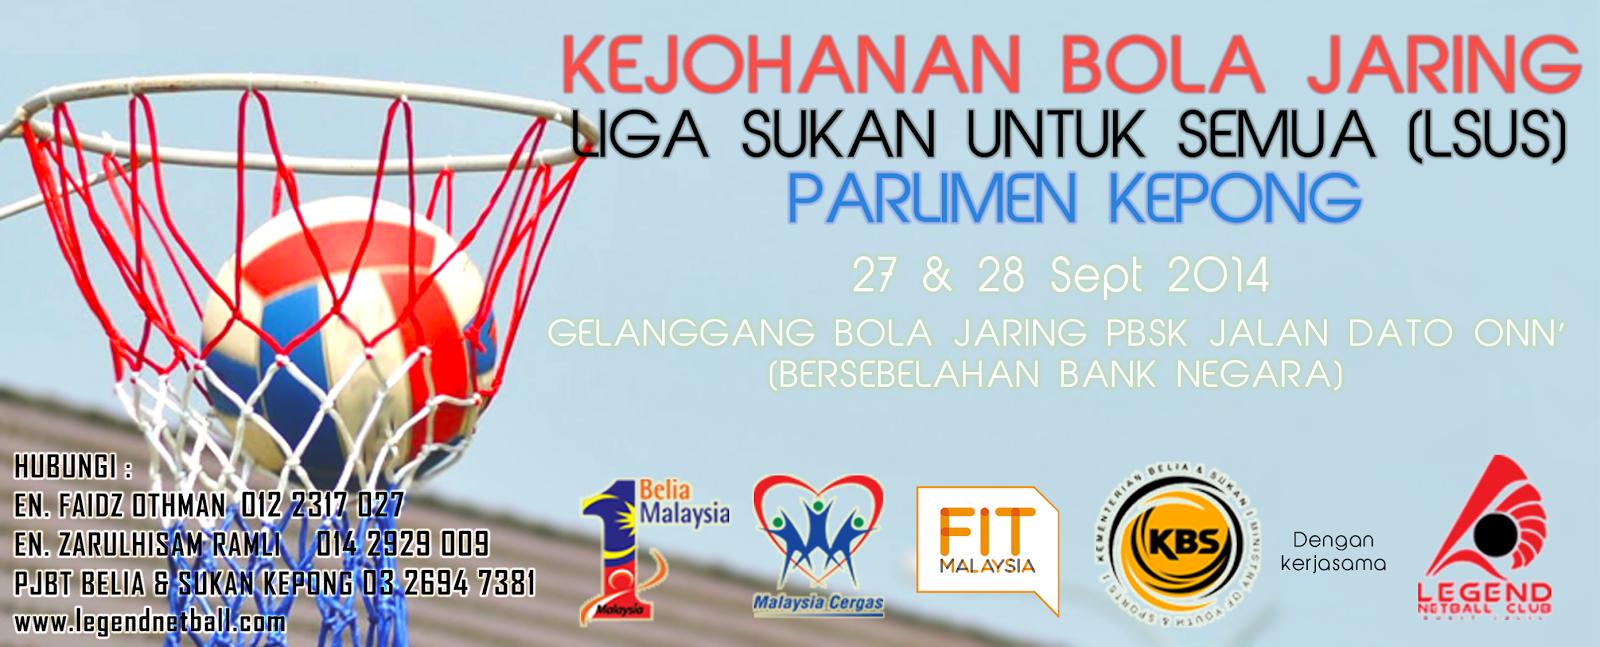 www.legendnetball.com